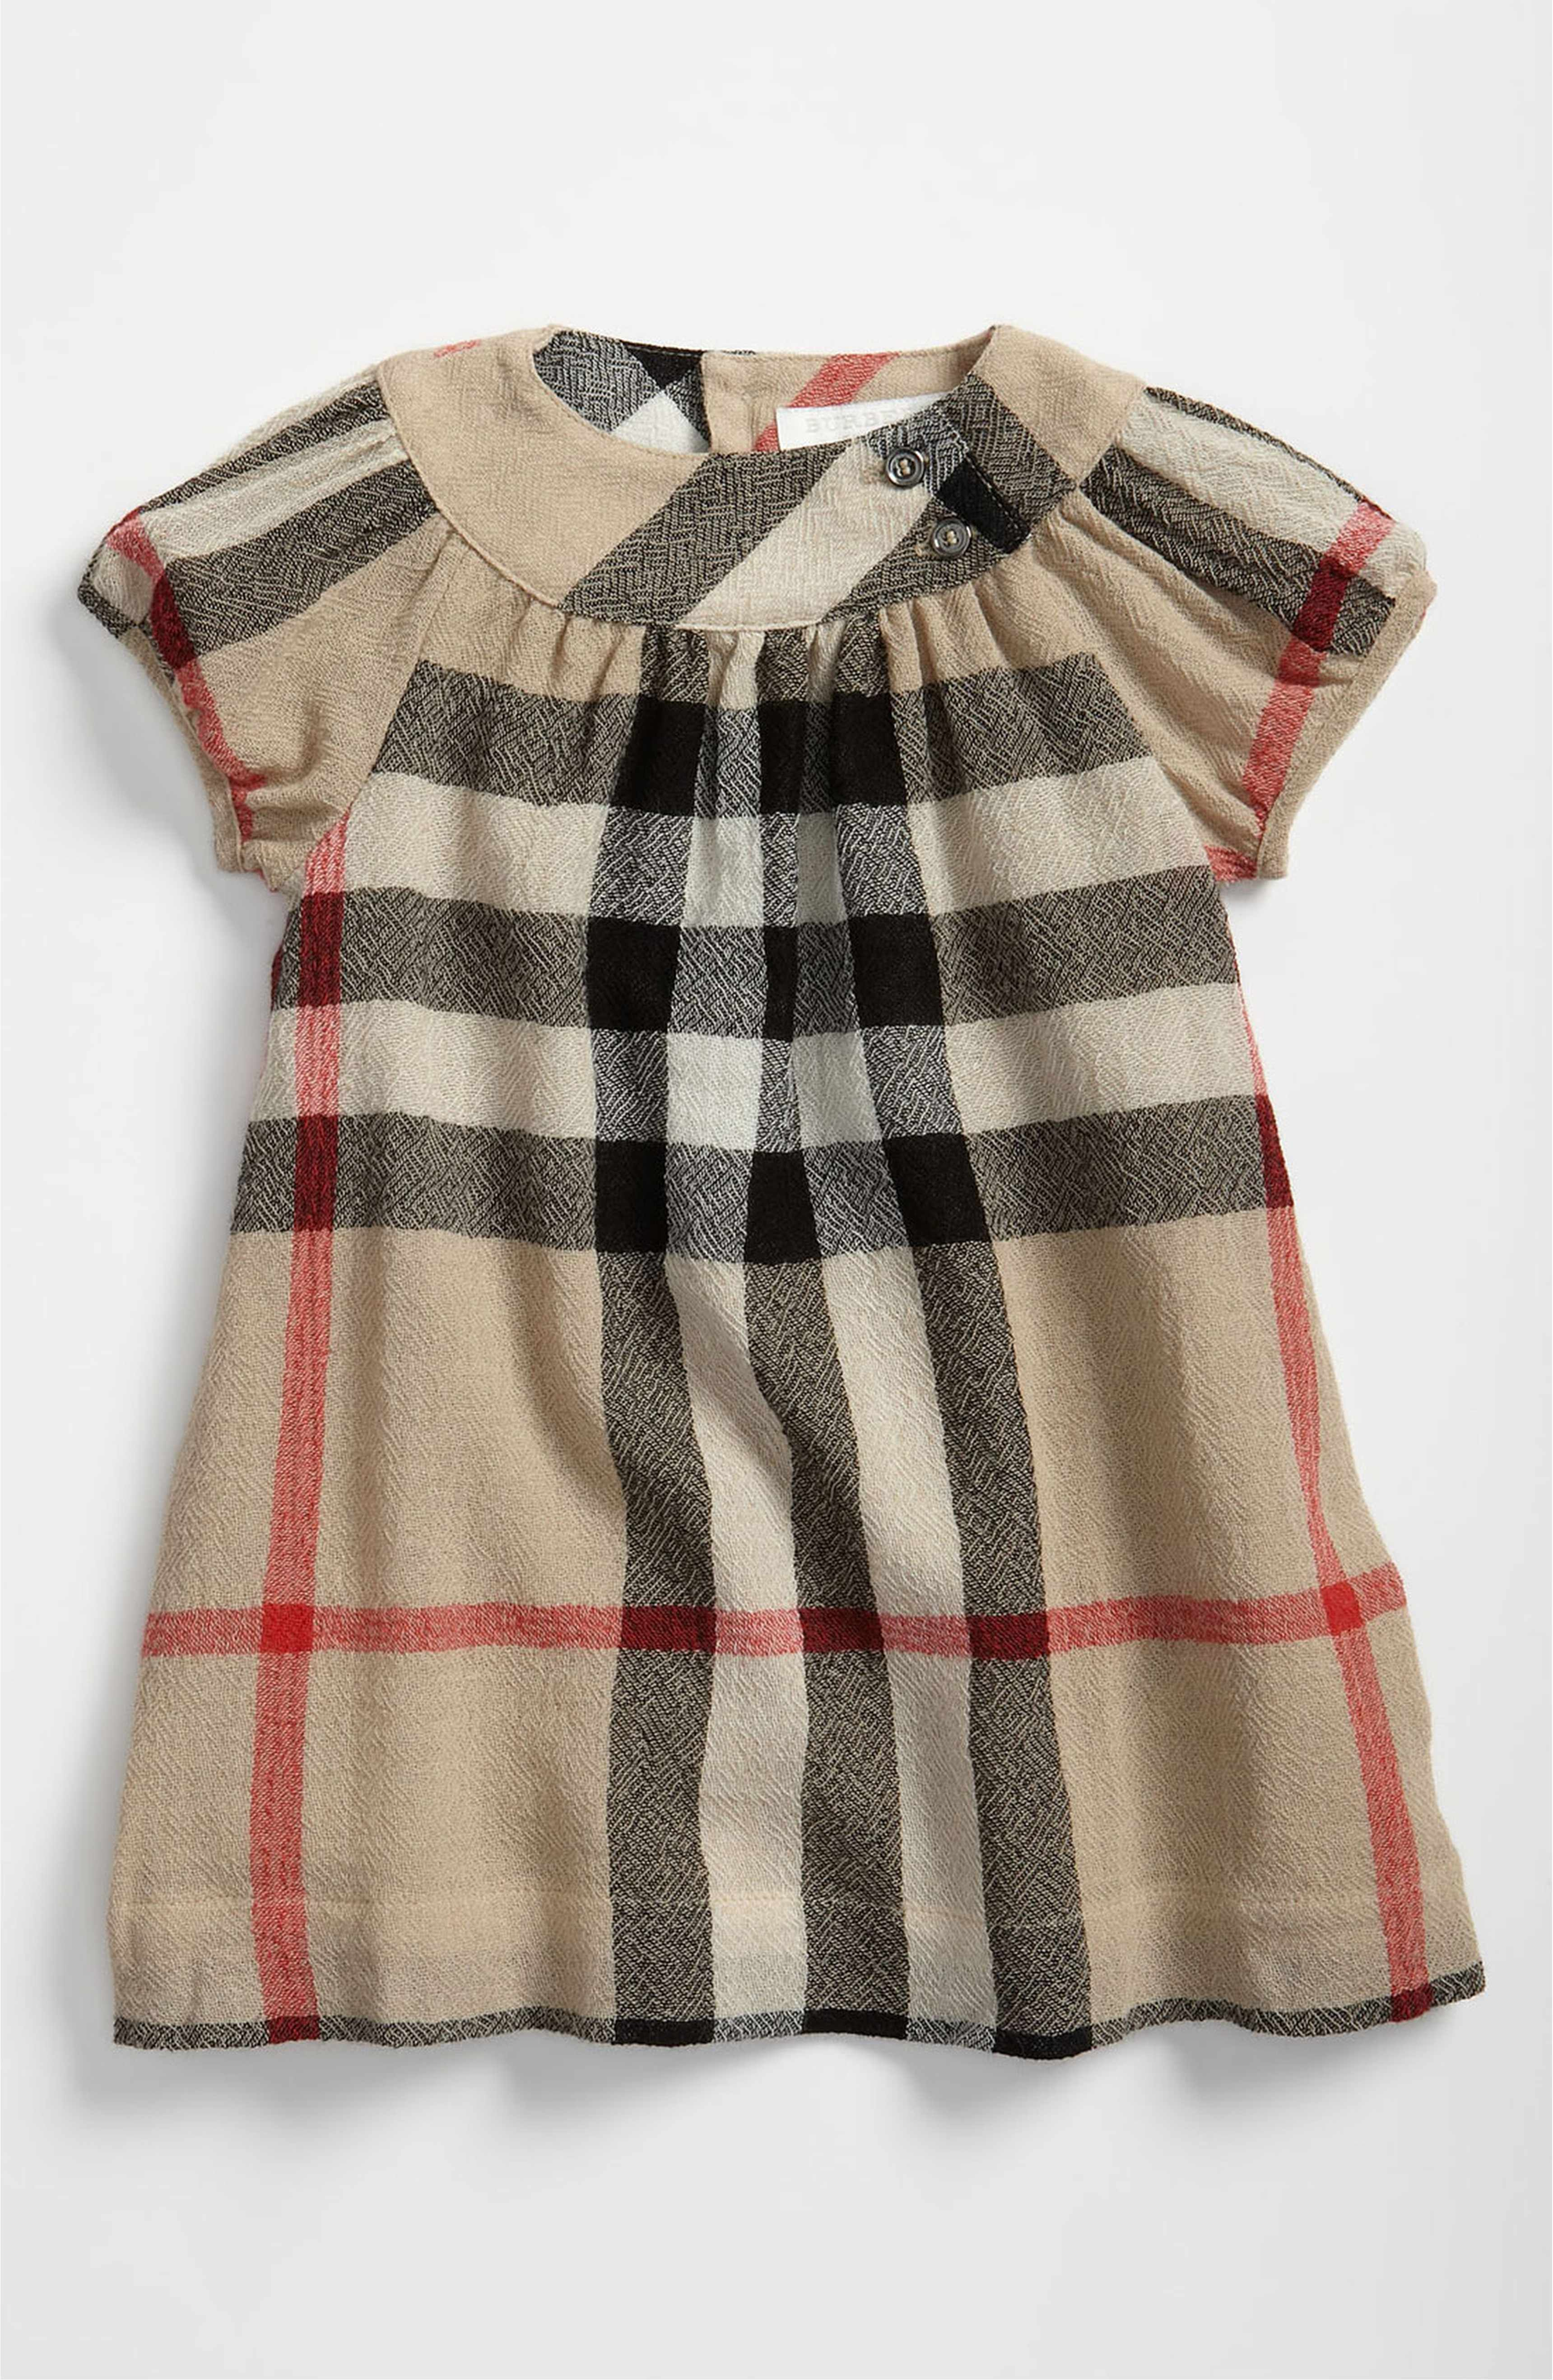 Main Image Burberry Check Print Dress Toddler